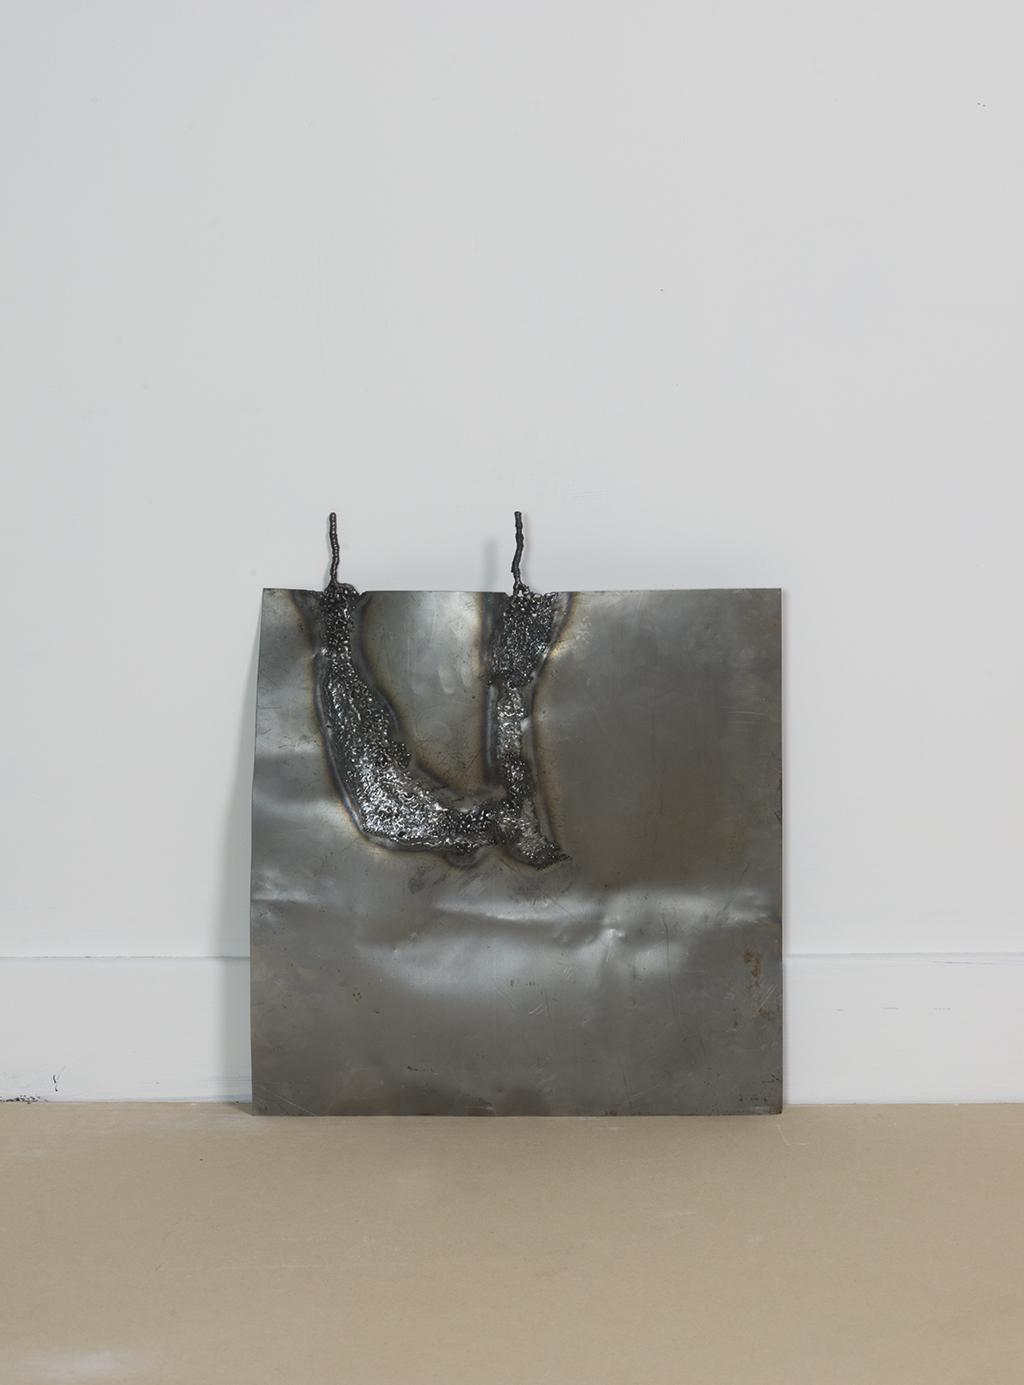 Mild steel and stainless steel weld. 55cm x 40cm x 7 cm.